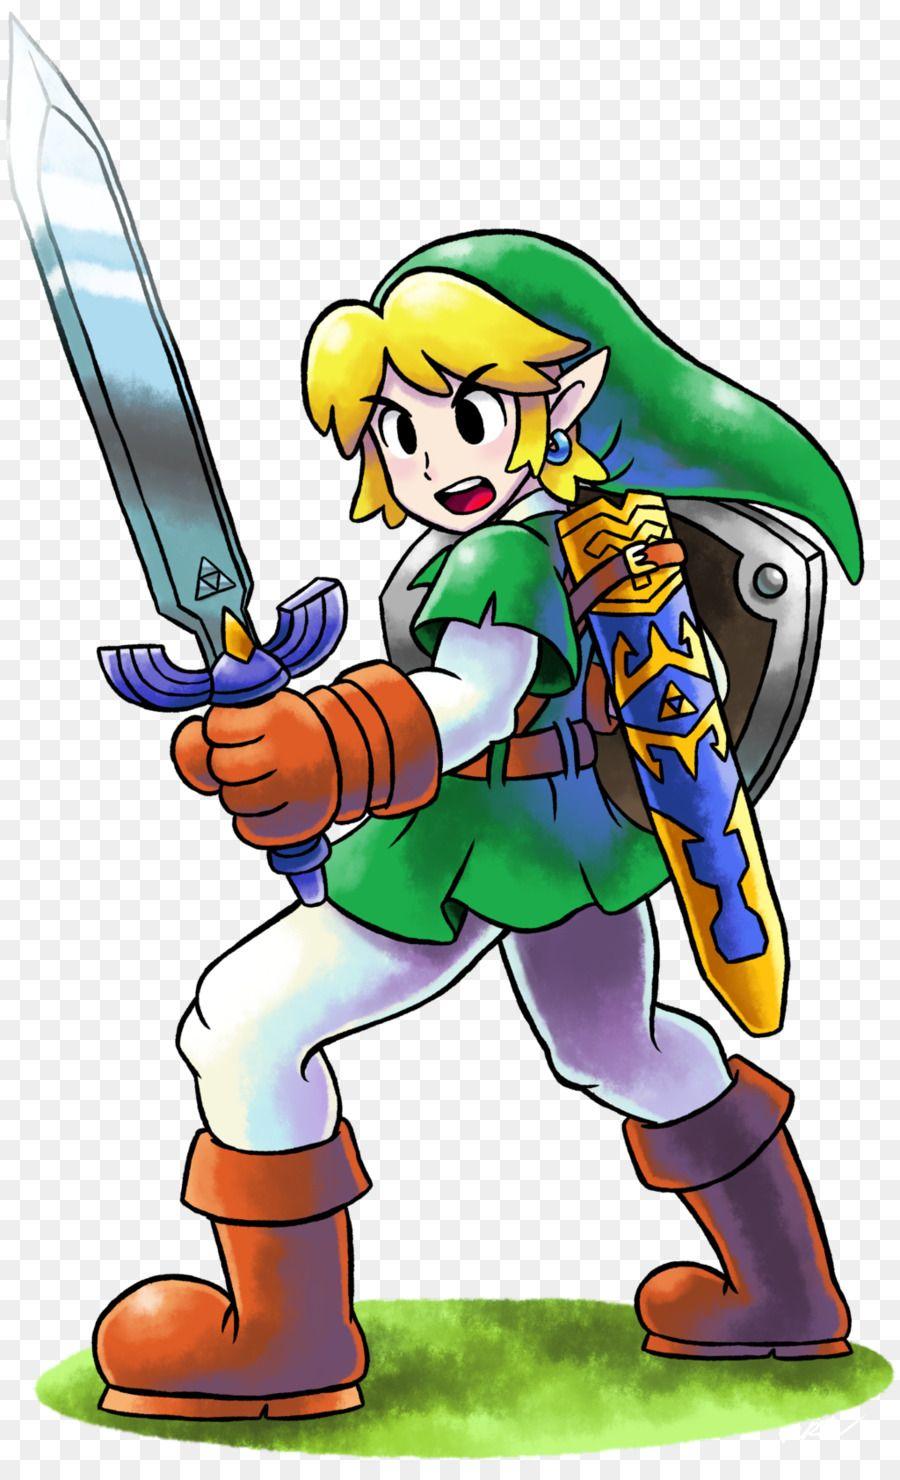 Mario & Luigi: Superstar Saga Super Mario RPG Link - rpg